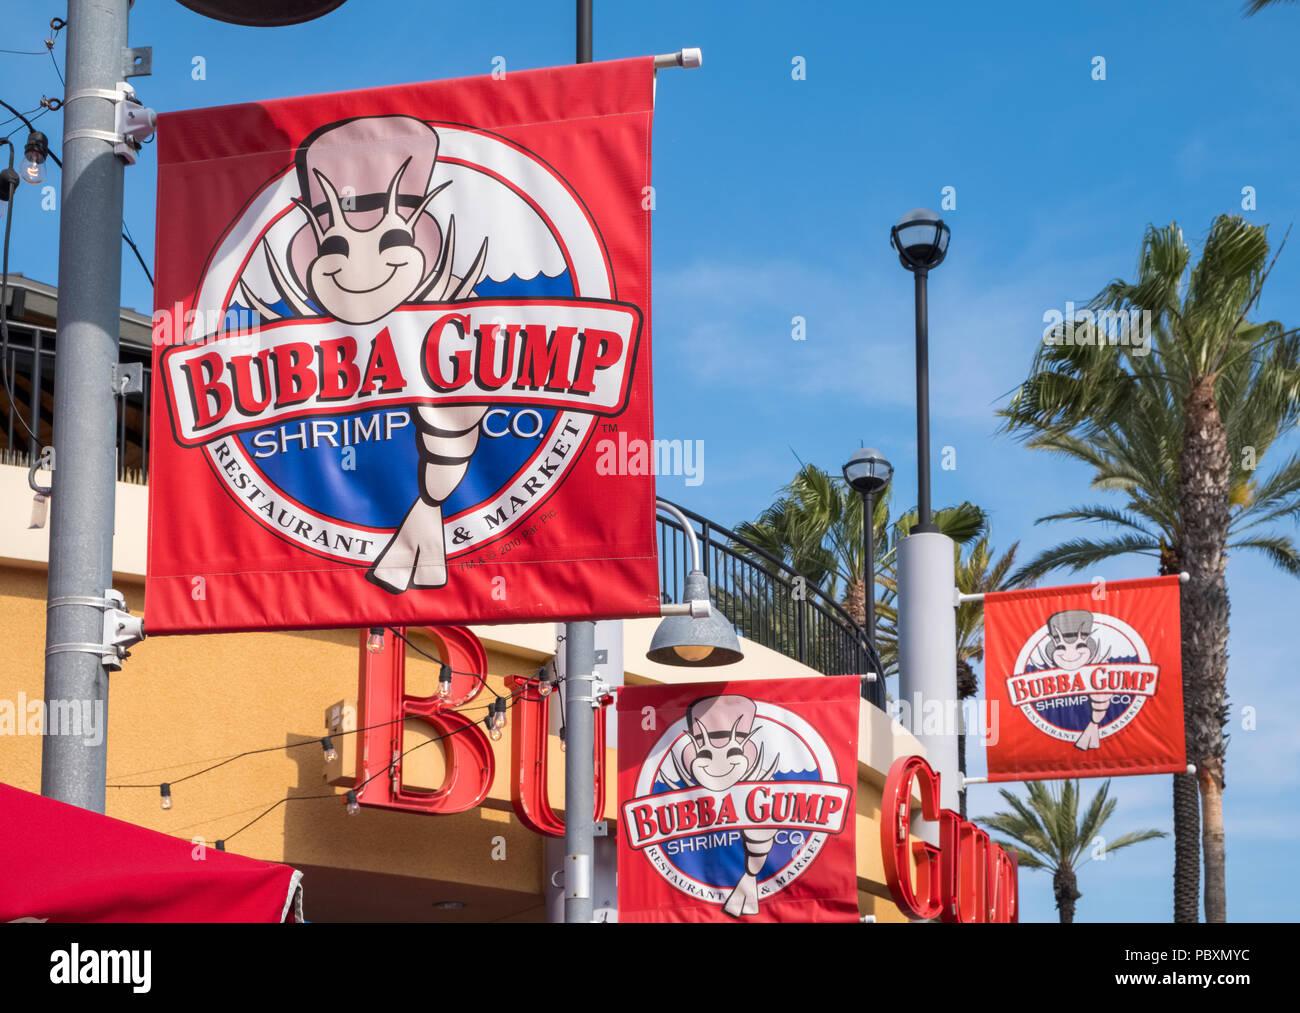 Logo sign for the Bubba Gump shrimp company restaurant chain, California, CA, USA - Stock Image